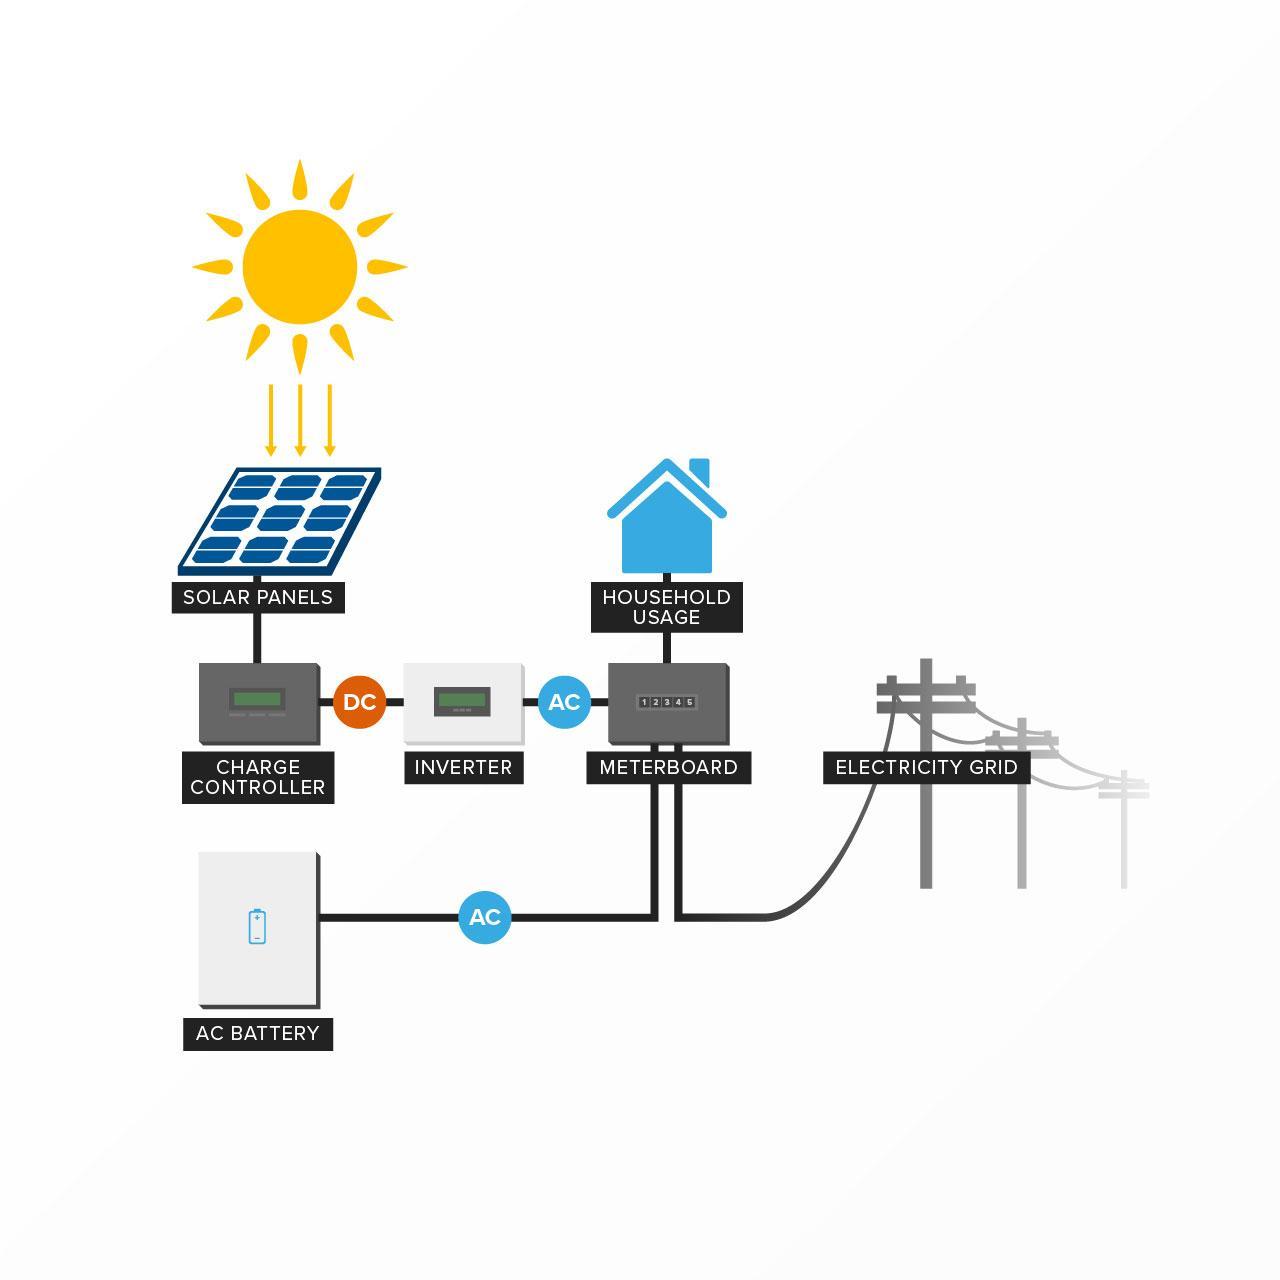 Alternating Current (AC) Batteries